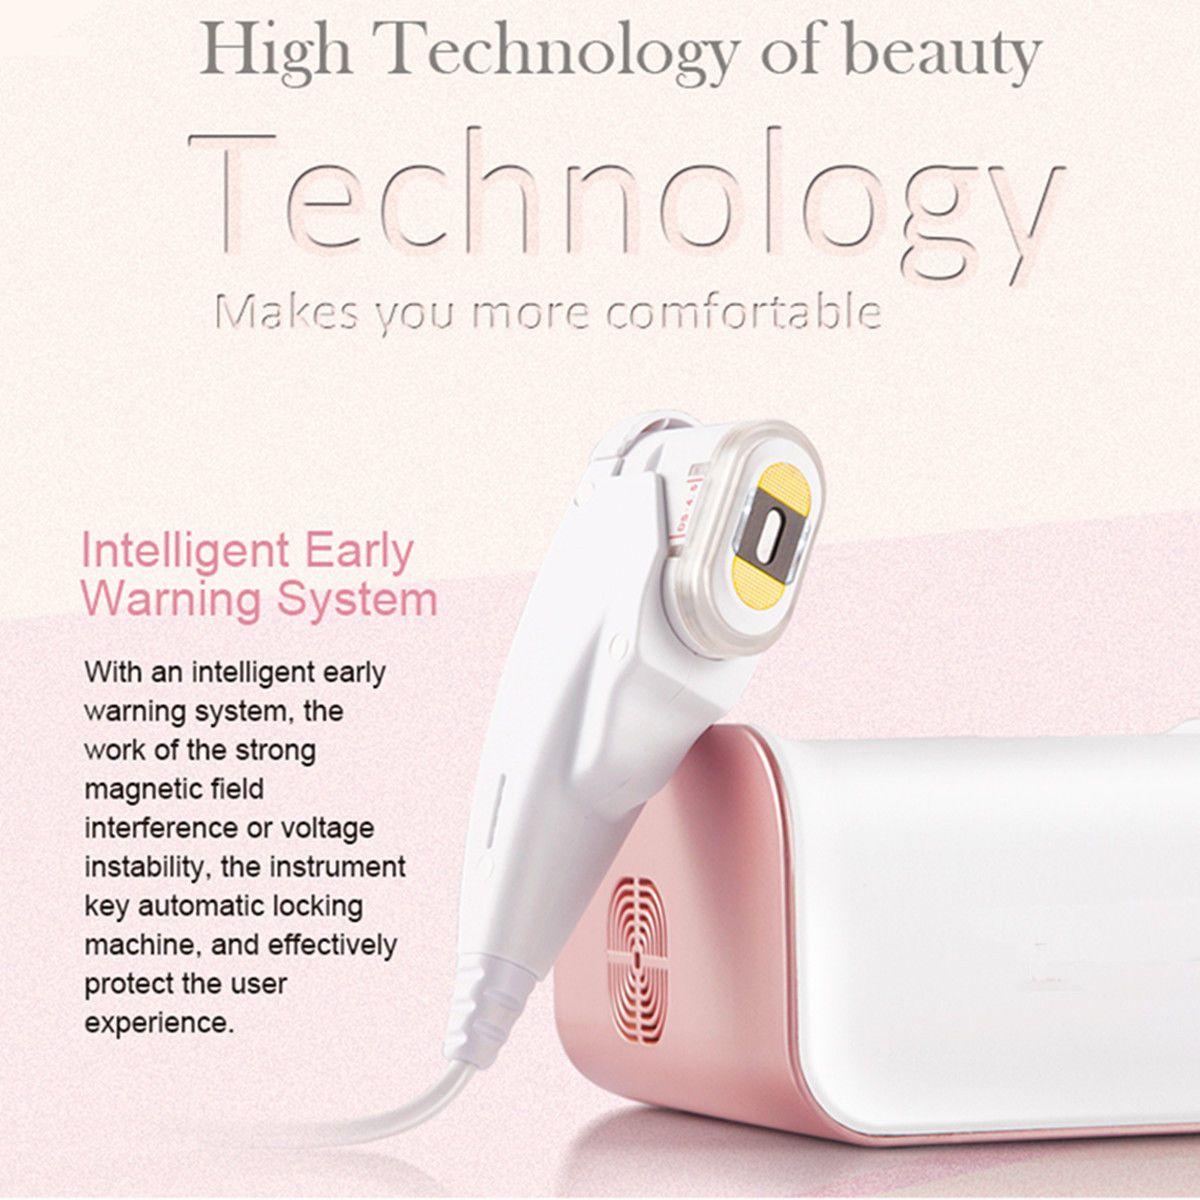 High Intensity Focused Ultrasound HIFU Ultrasonic RF Skin Care Beauty Massage Face SPA Machine Lifting SMAS Contraction